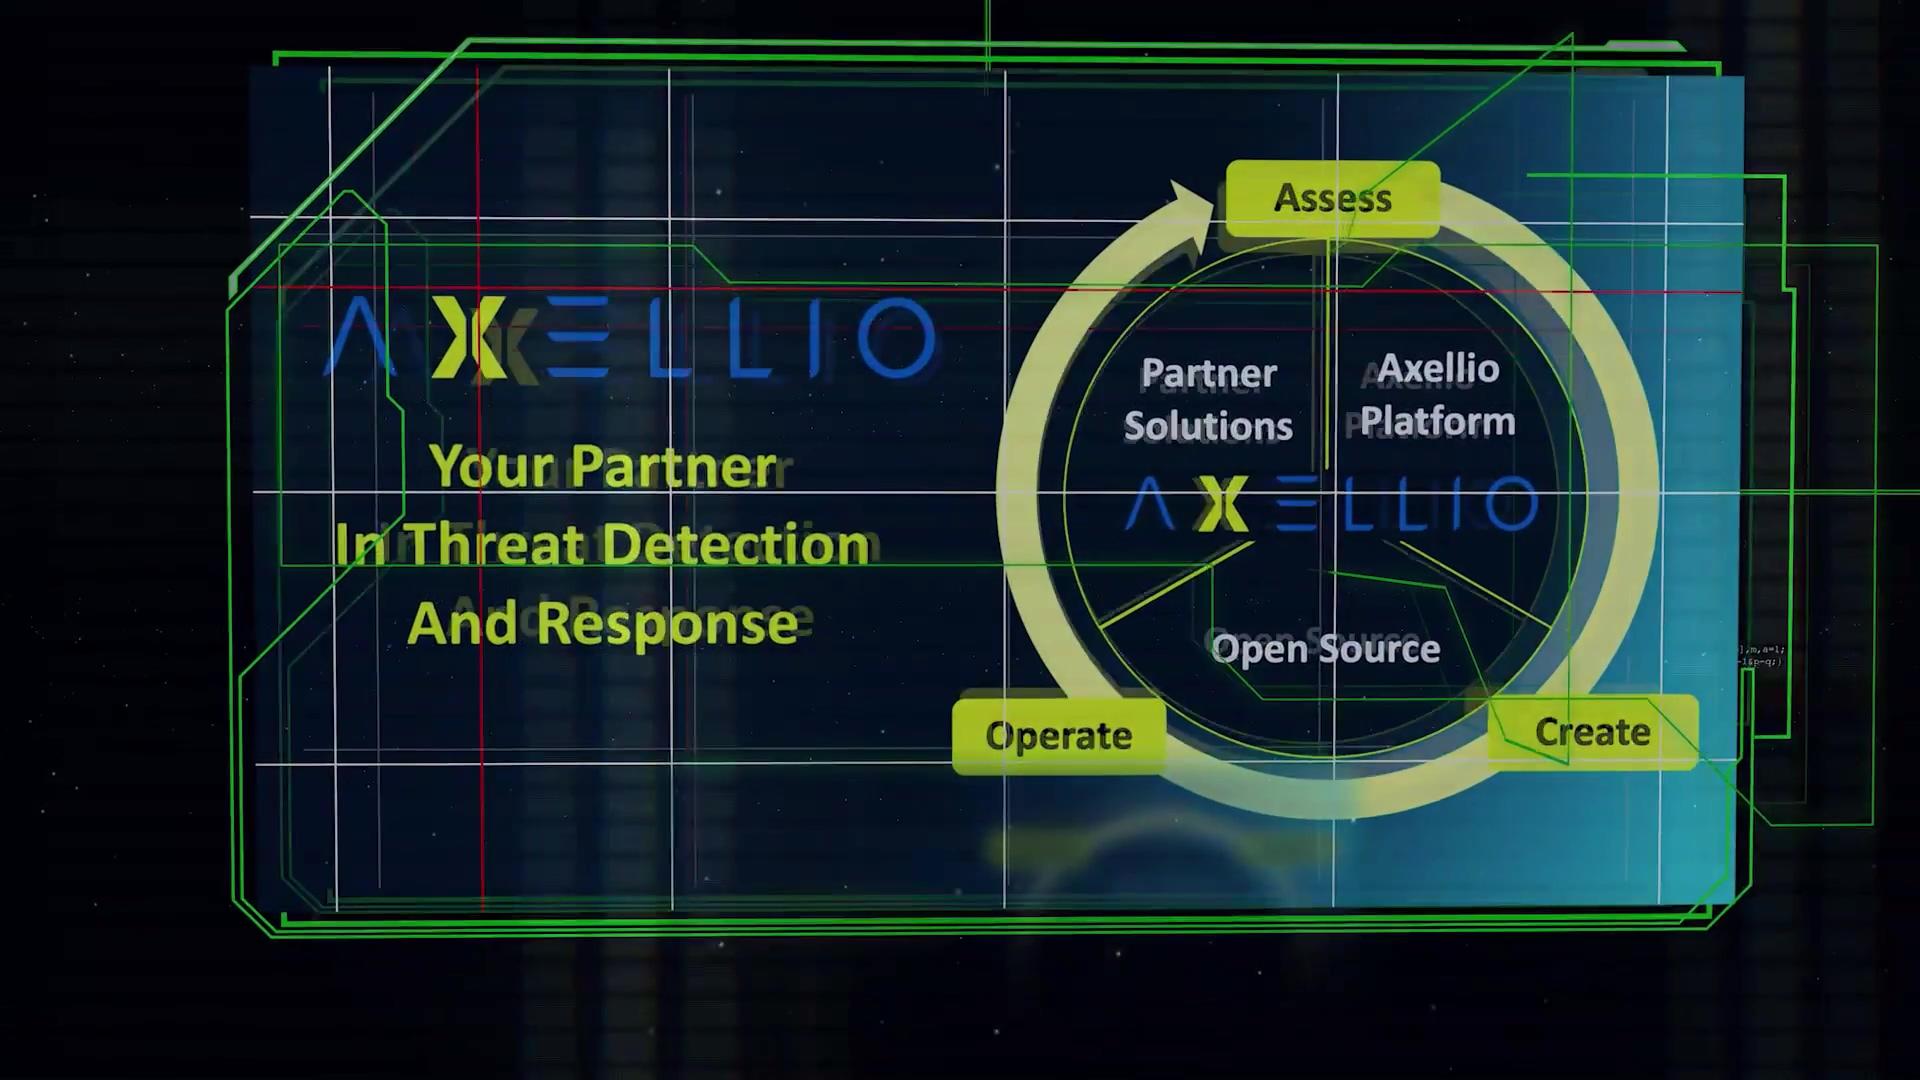 Axellio - Cyber Threat In the News 2021-08